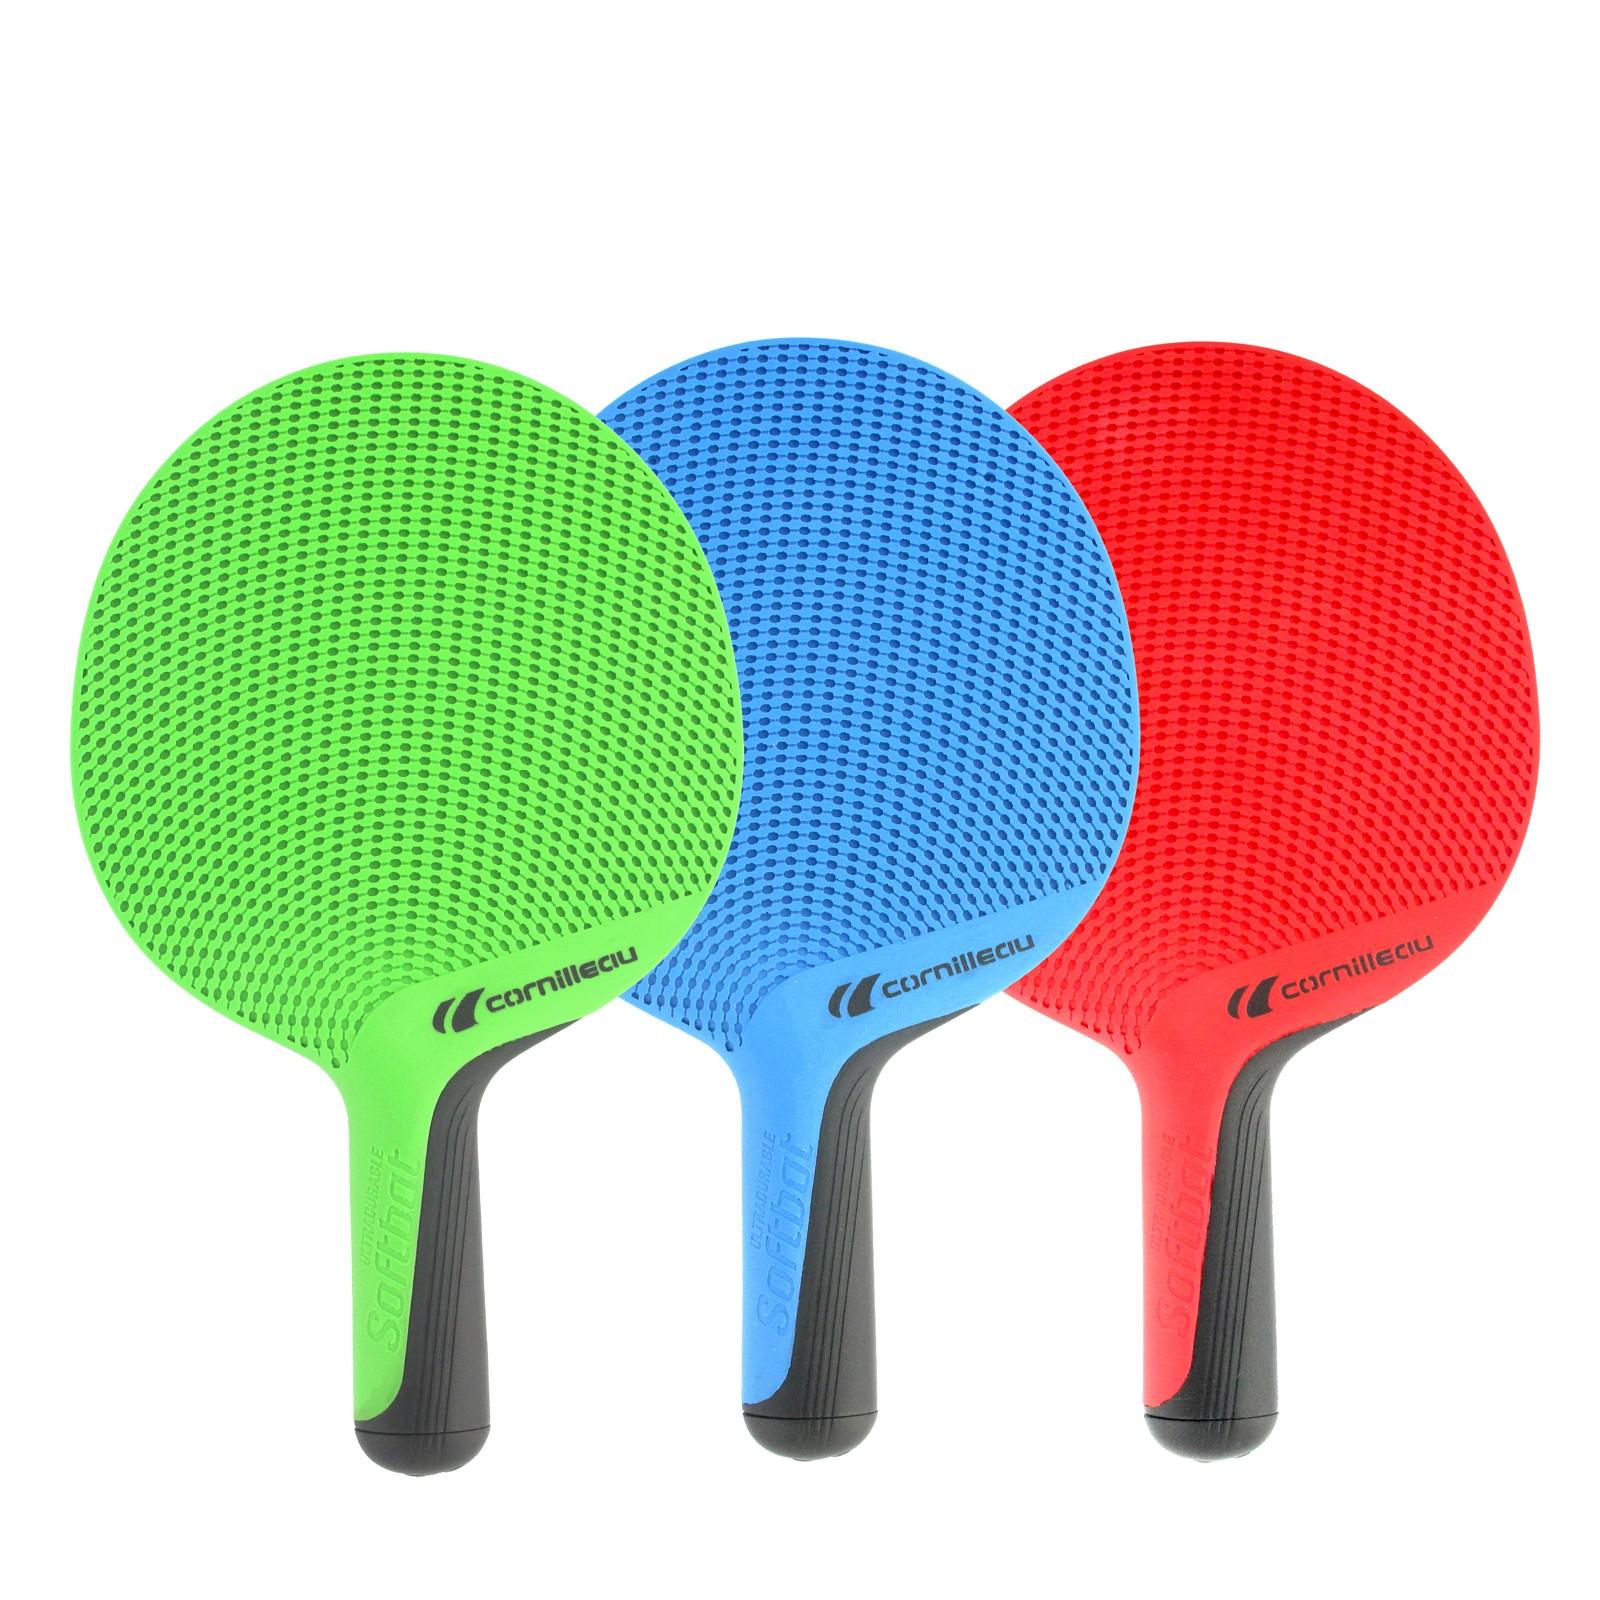 Cornilleau tischtennisschl ger softbat sport tiedje - Raquette de tennis de table cornilleau ...